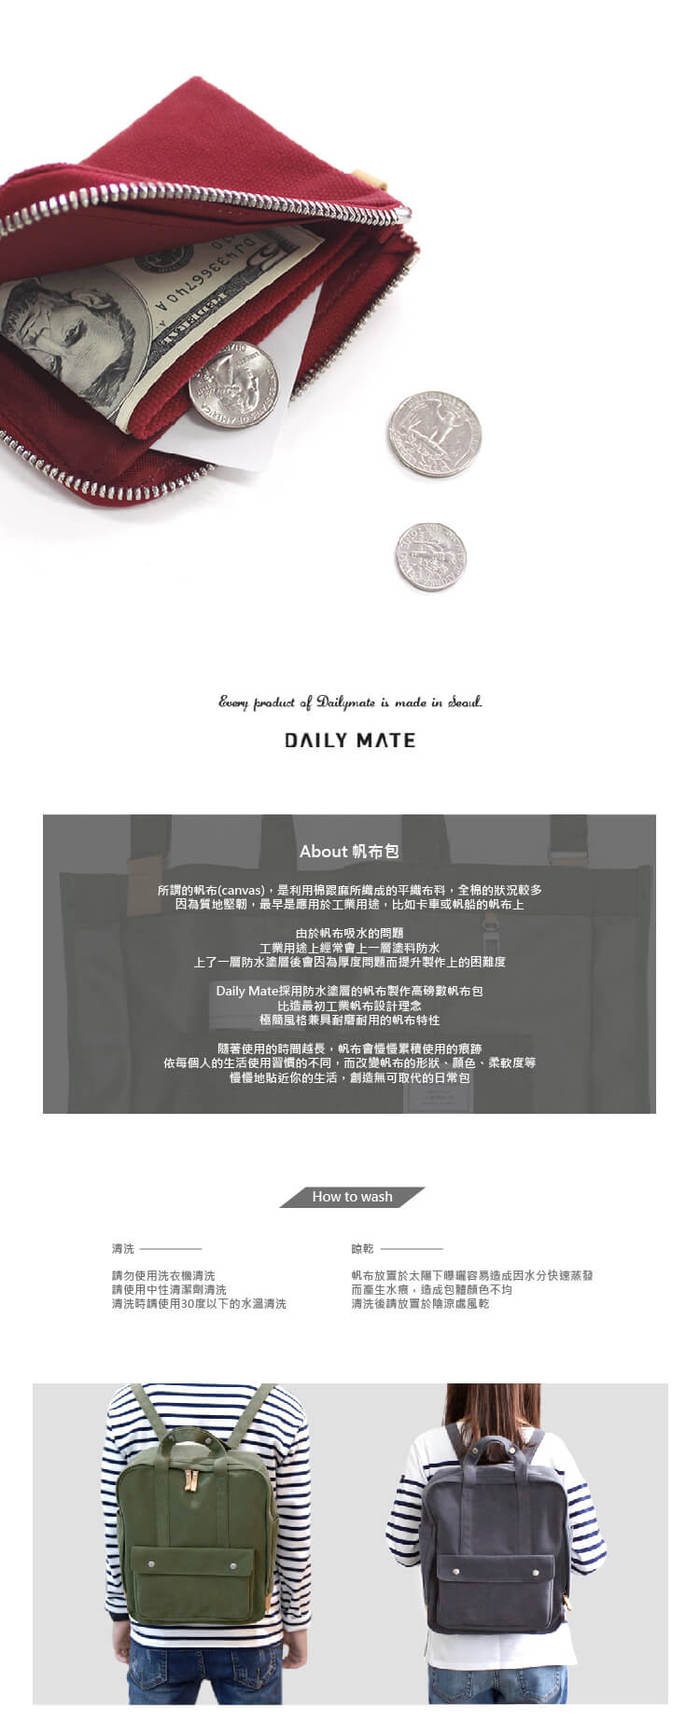 Daily mate|萬用小錢包(米色)